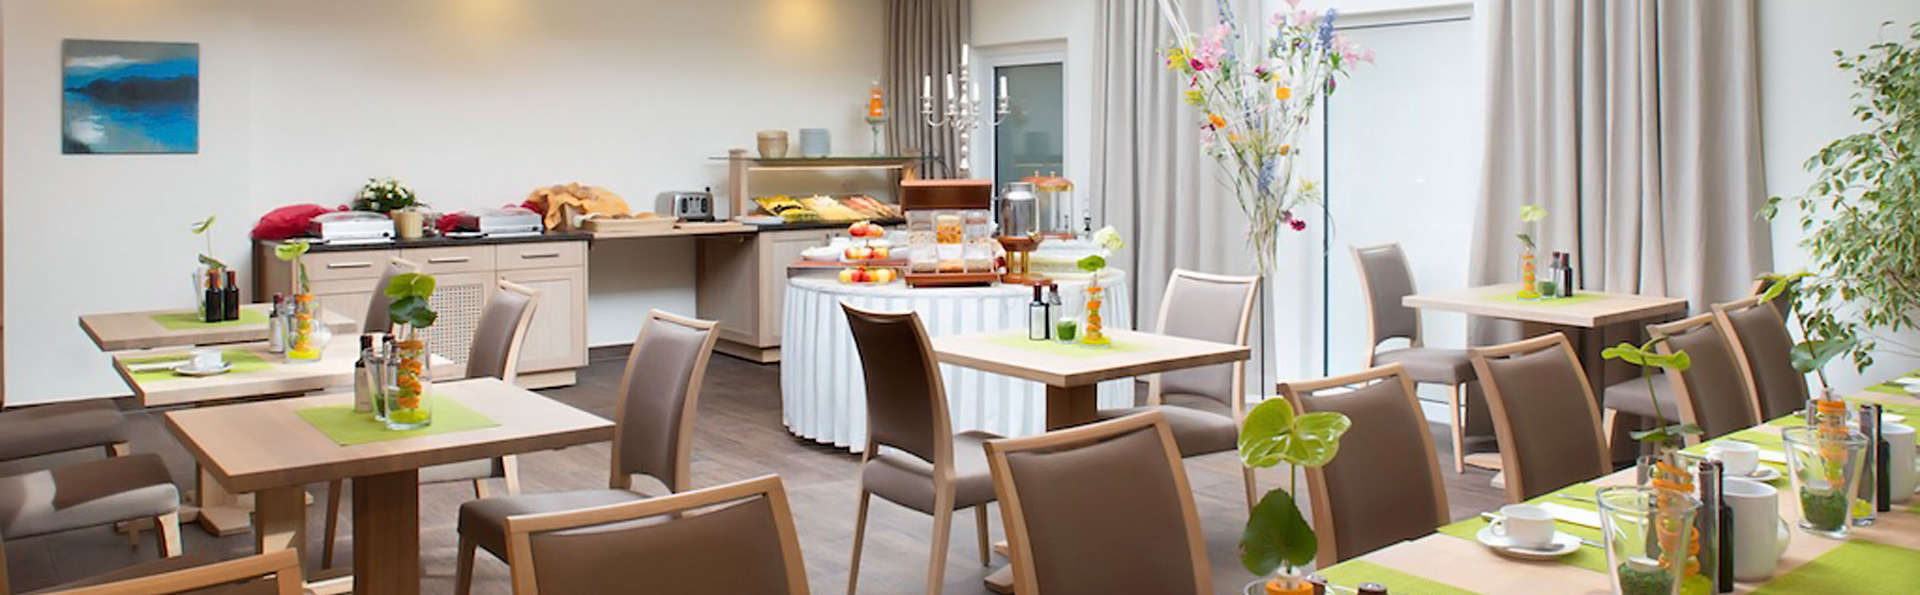 Central Hotel Ringhotel Rüdesheim - EDIT_breakfast.jpg